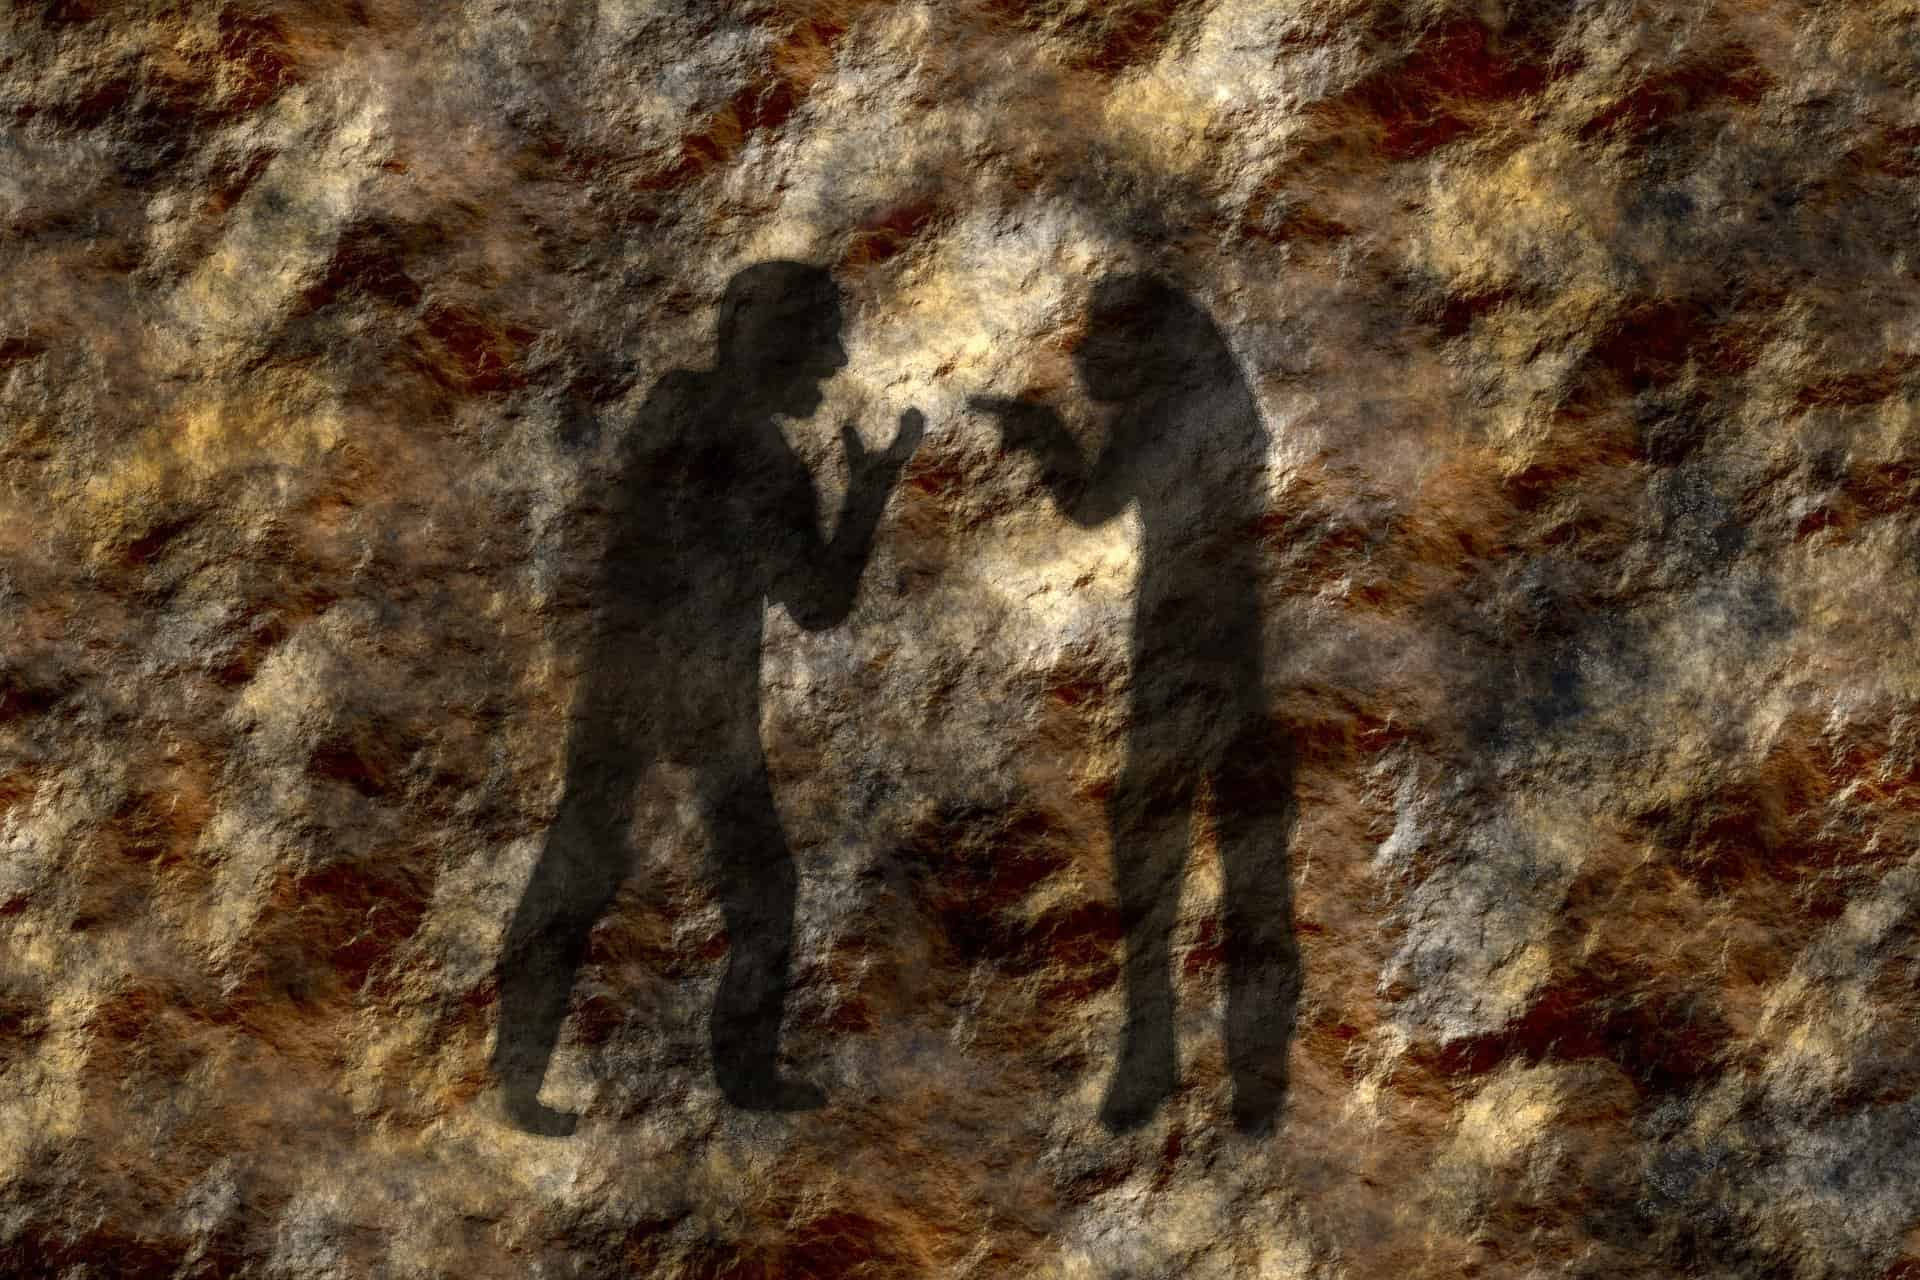 Höhlenmalerei - Quelle: geralt (Pixabay)